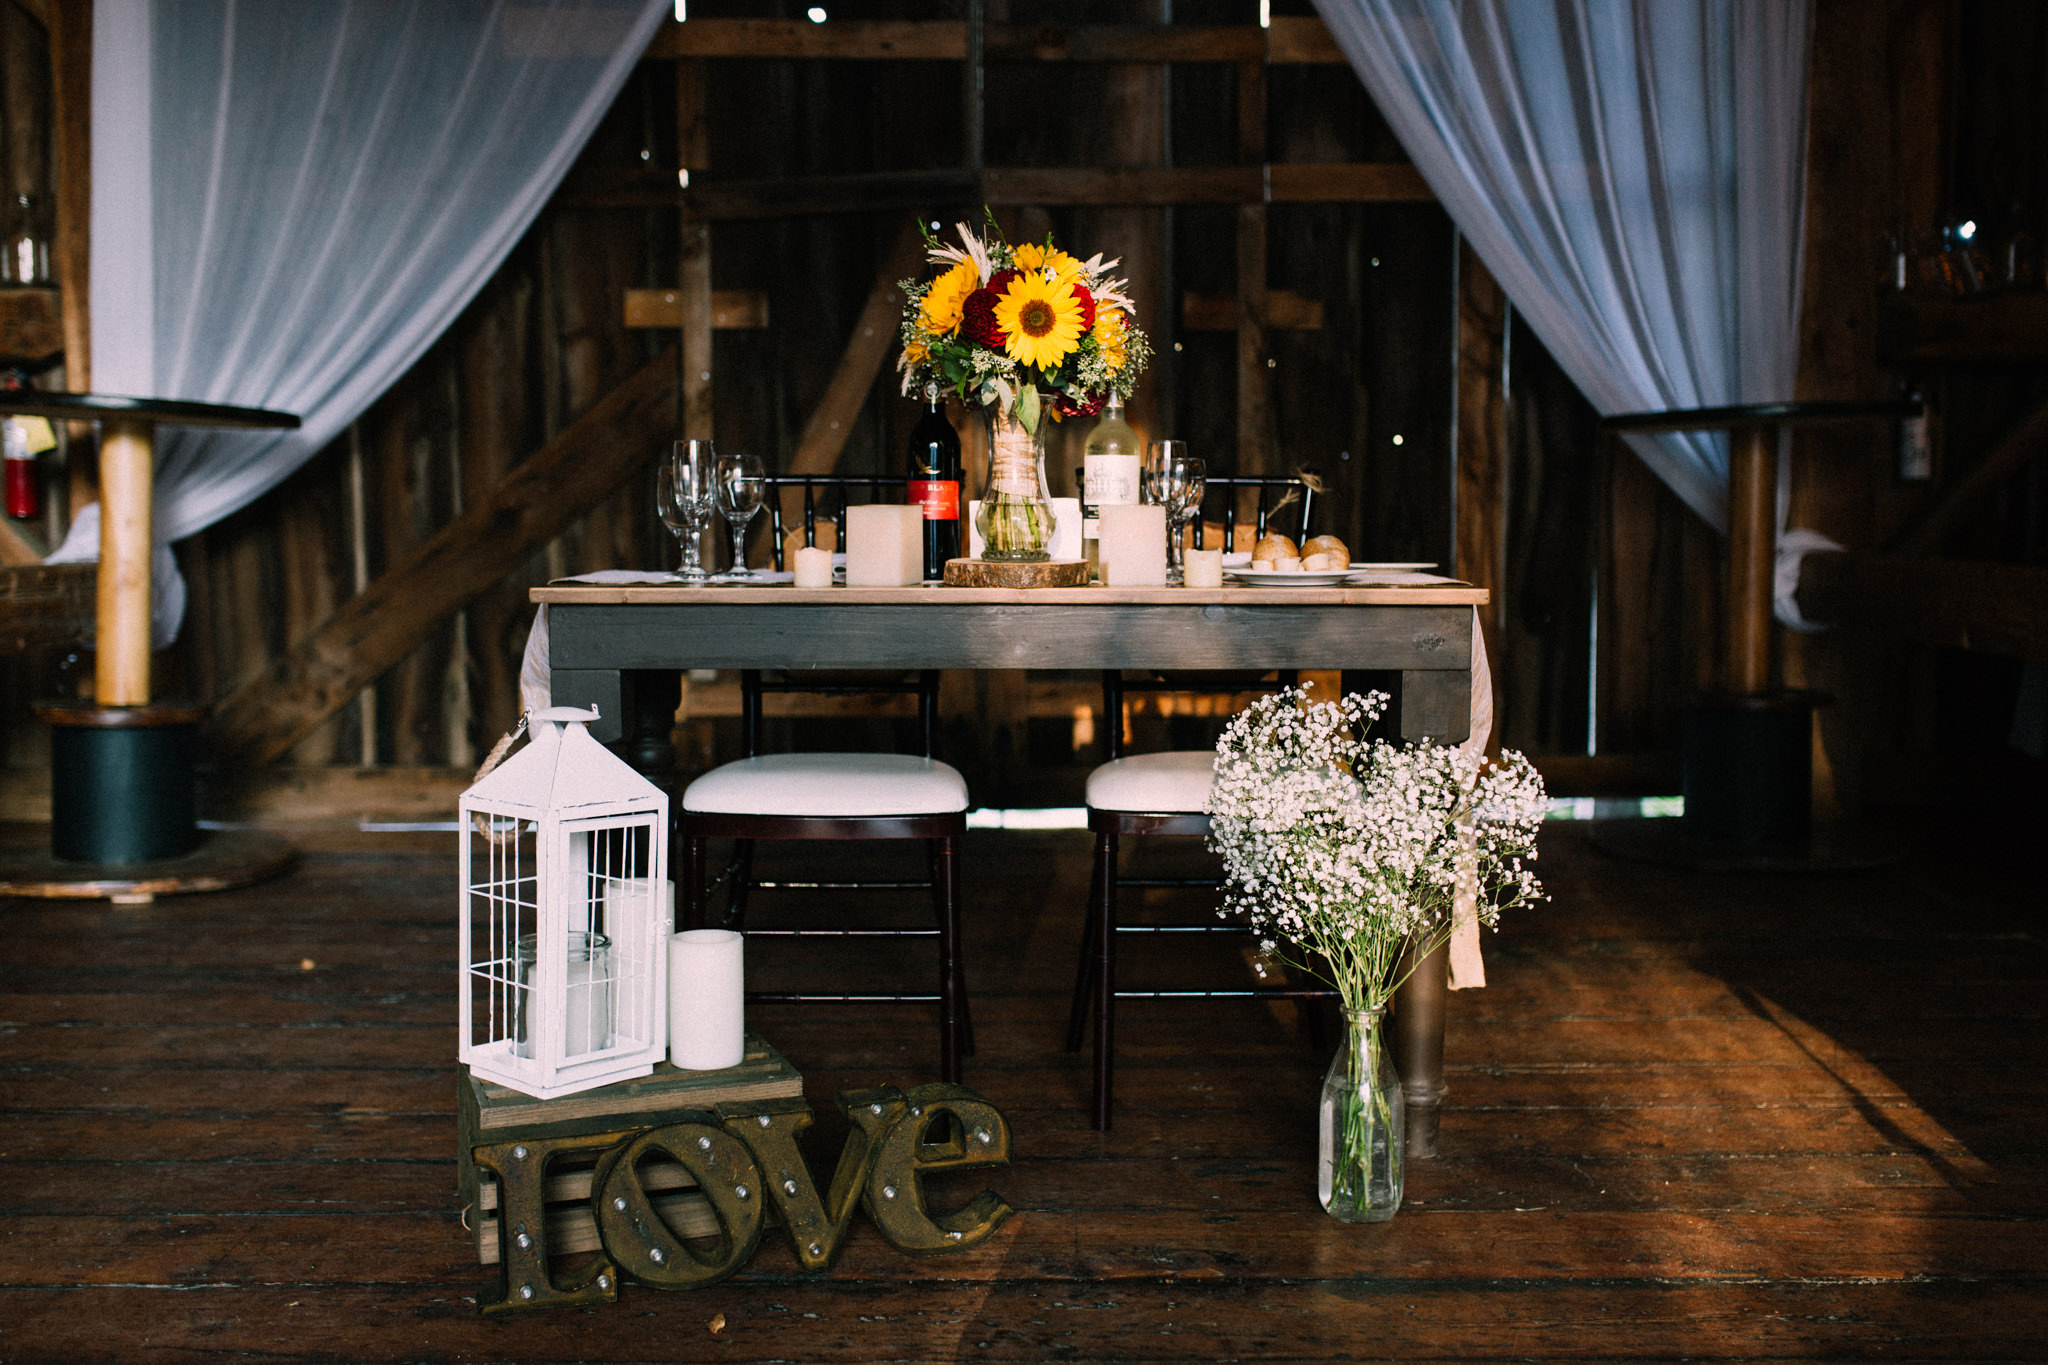 Muskoka rustic farm wedding at Brookland Farm by Max Wong Photo (26)